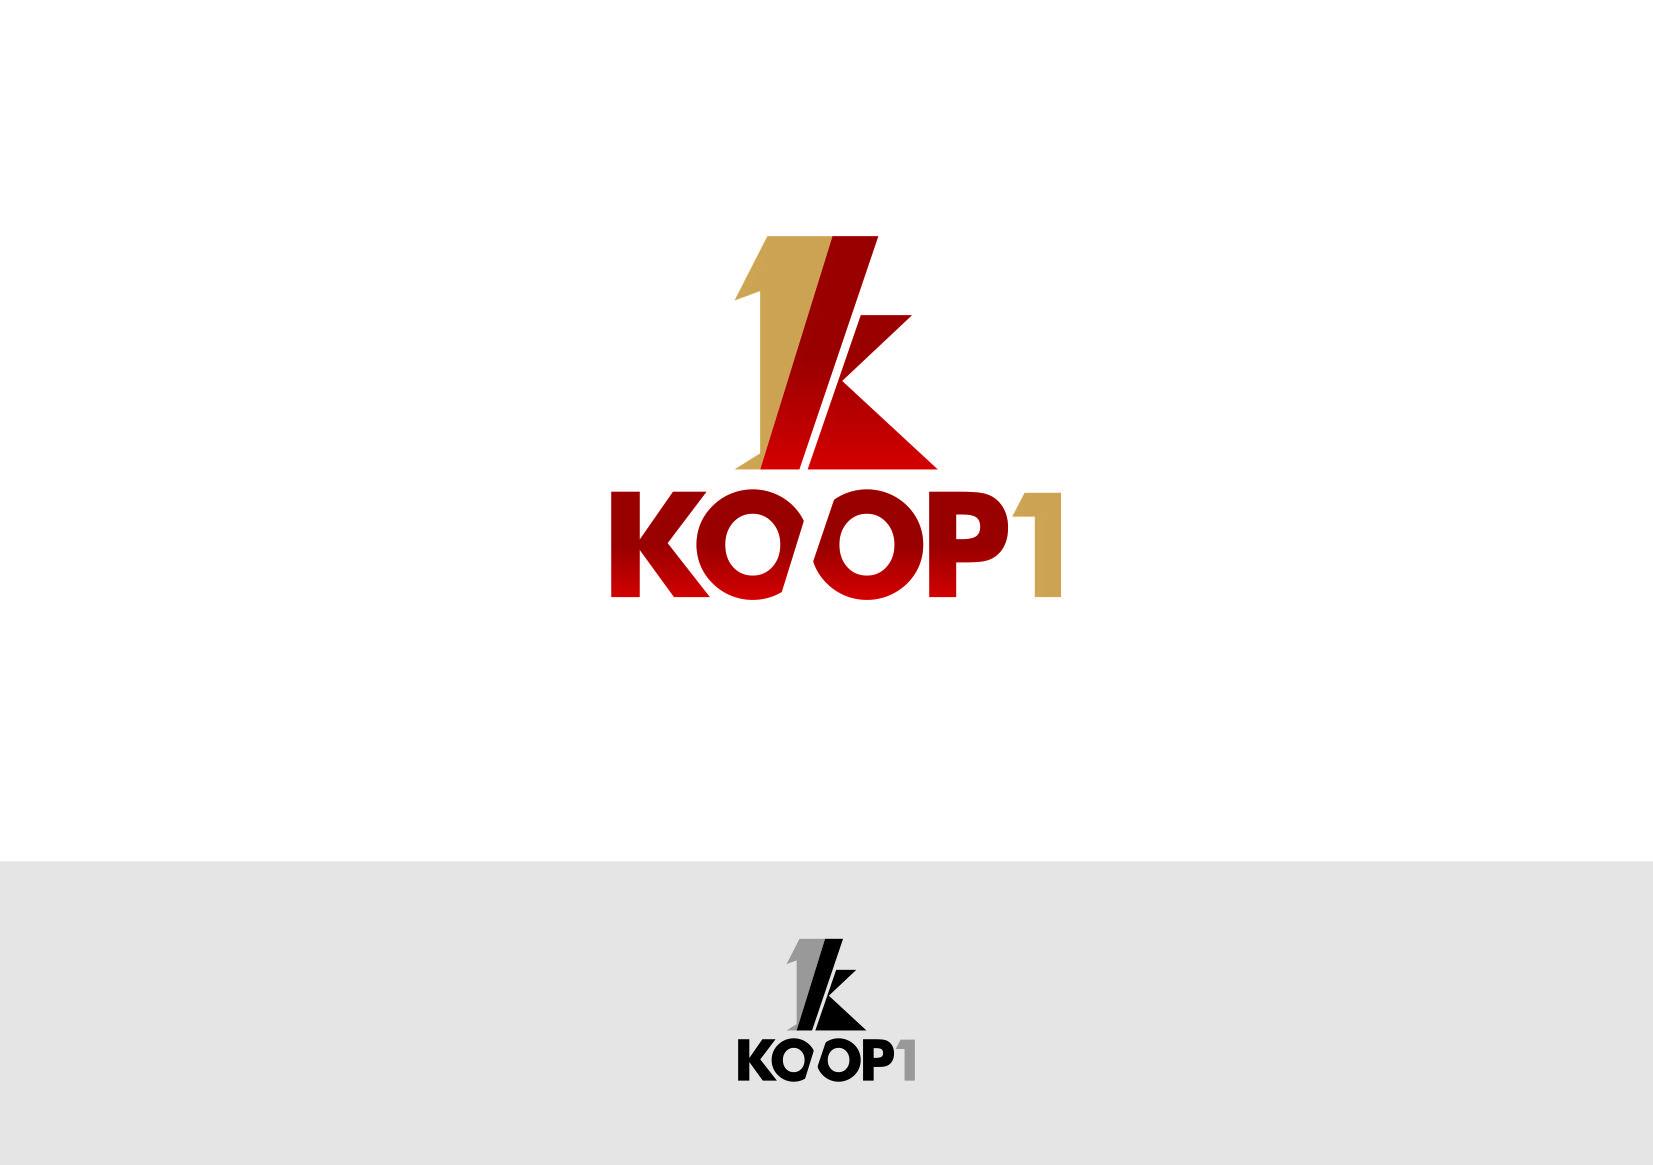 Logo Design by Ravi Shanker - Entry No. 219 in the Logo Design Contest Creative Logo Design for KOOP 1.